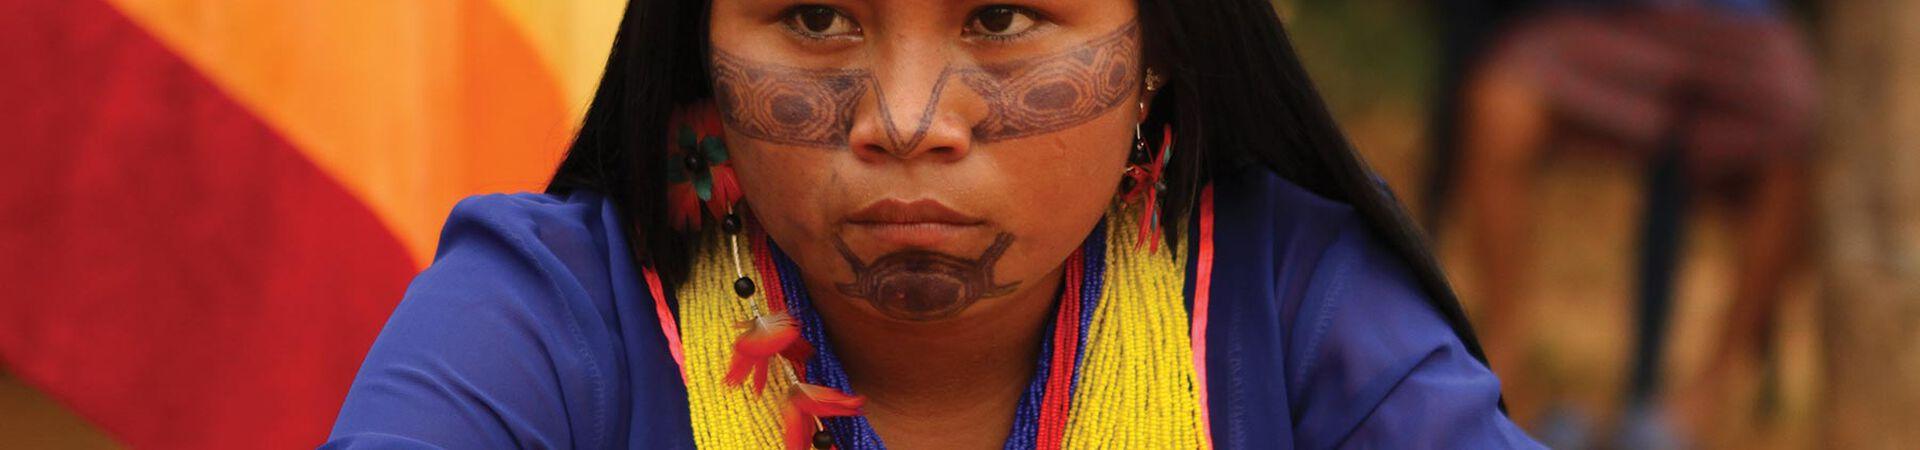 Banner - Pueblo Originario Kichwa de Sarayaku